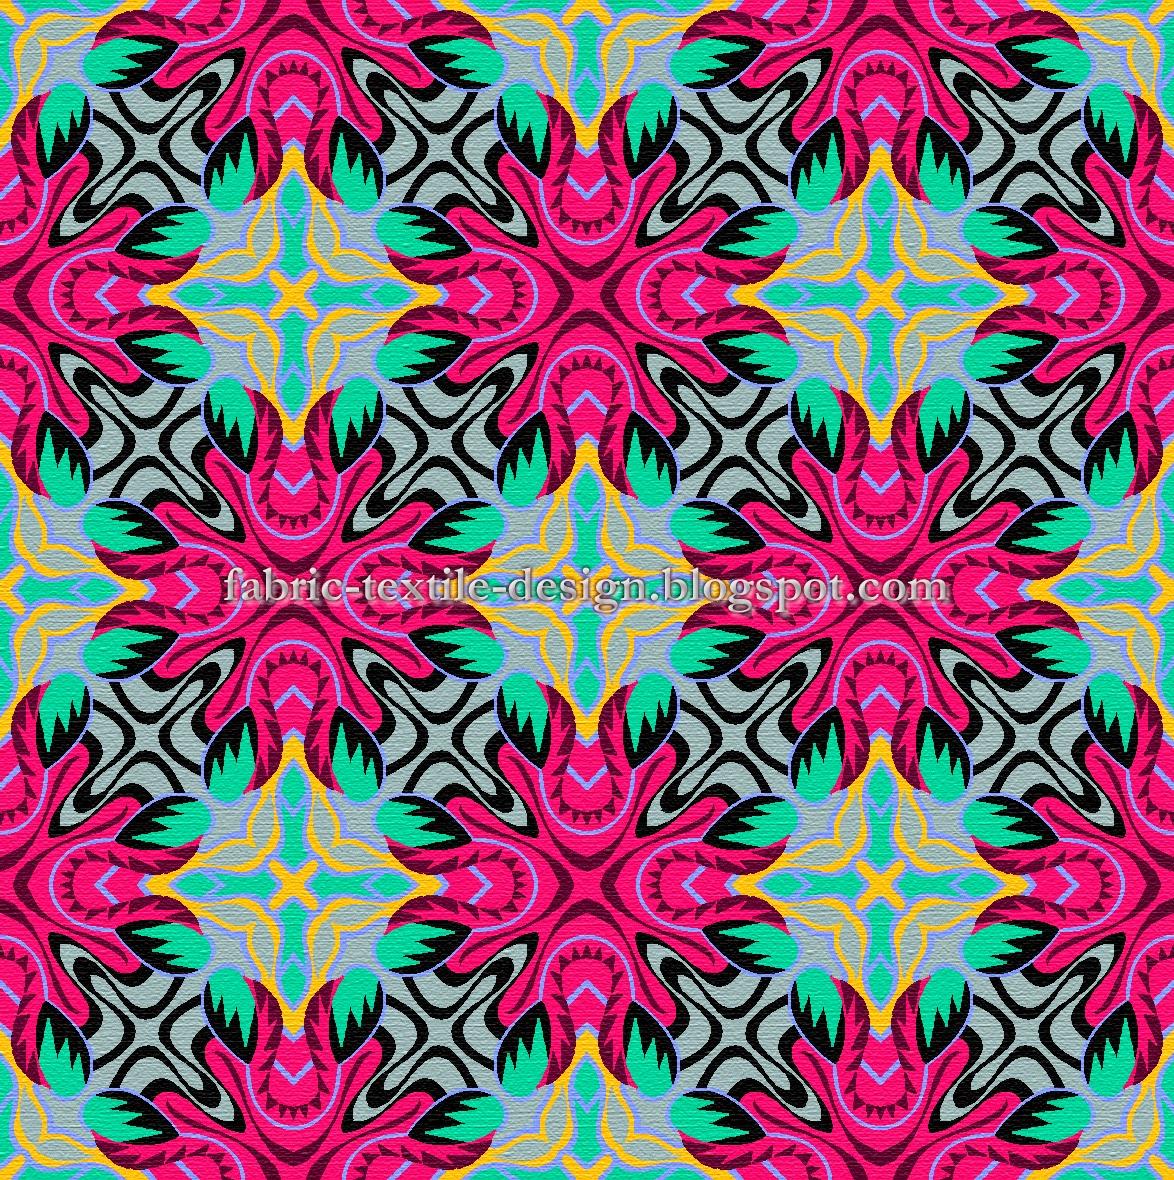 New Design Pattern For Jacquard Digital Print Design Fabric